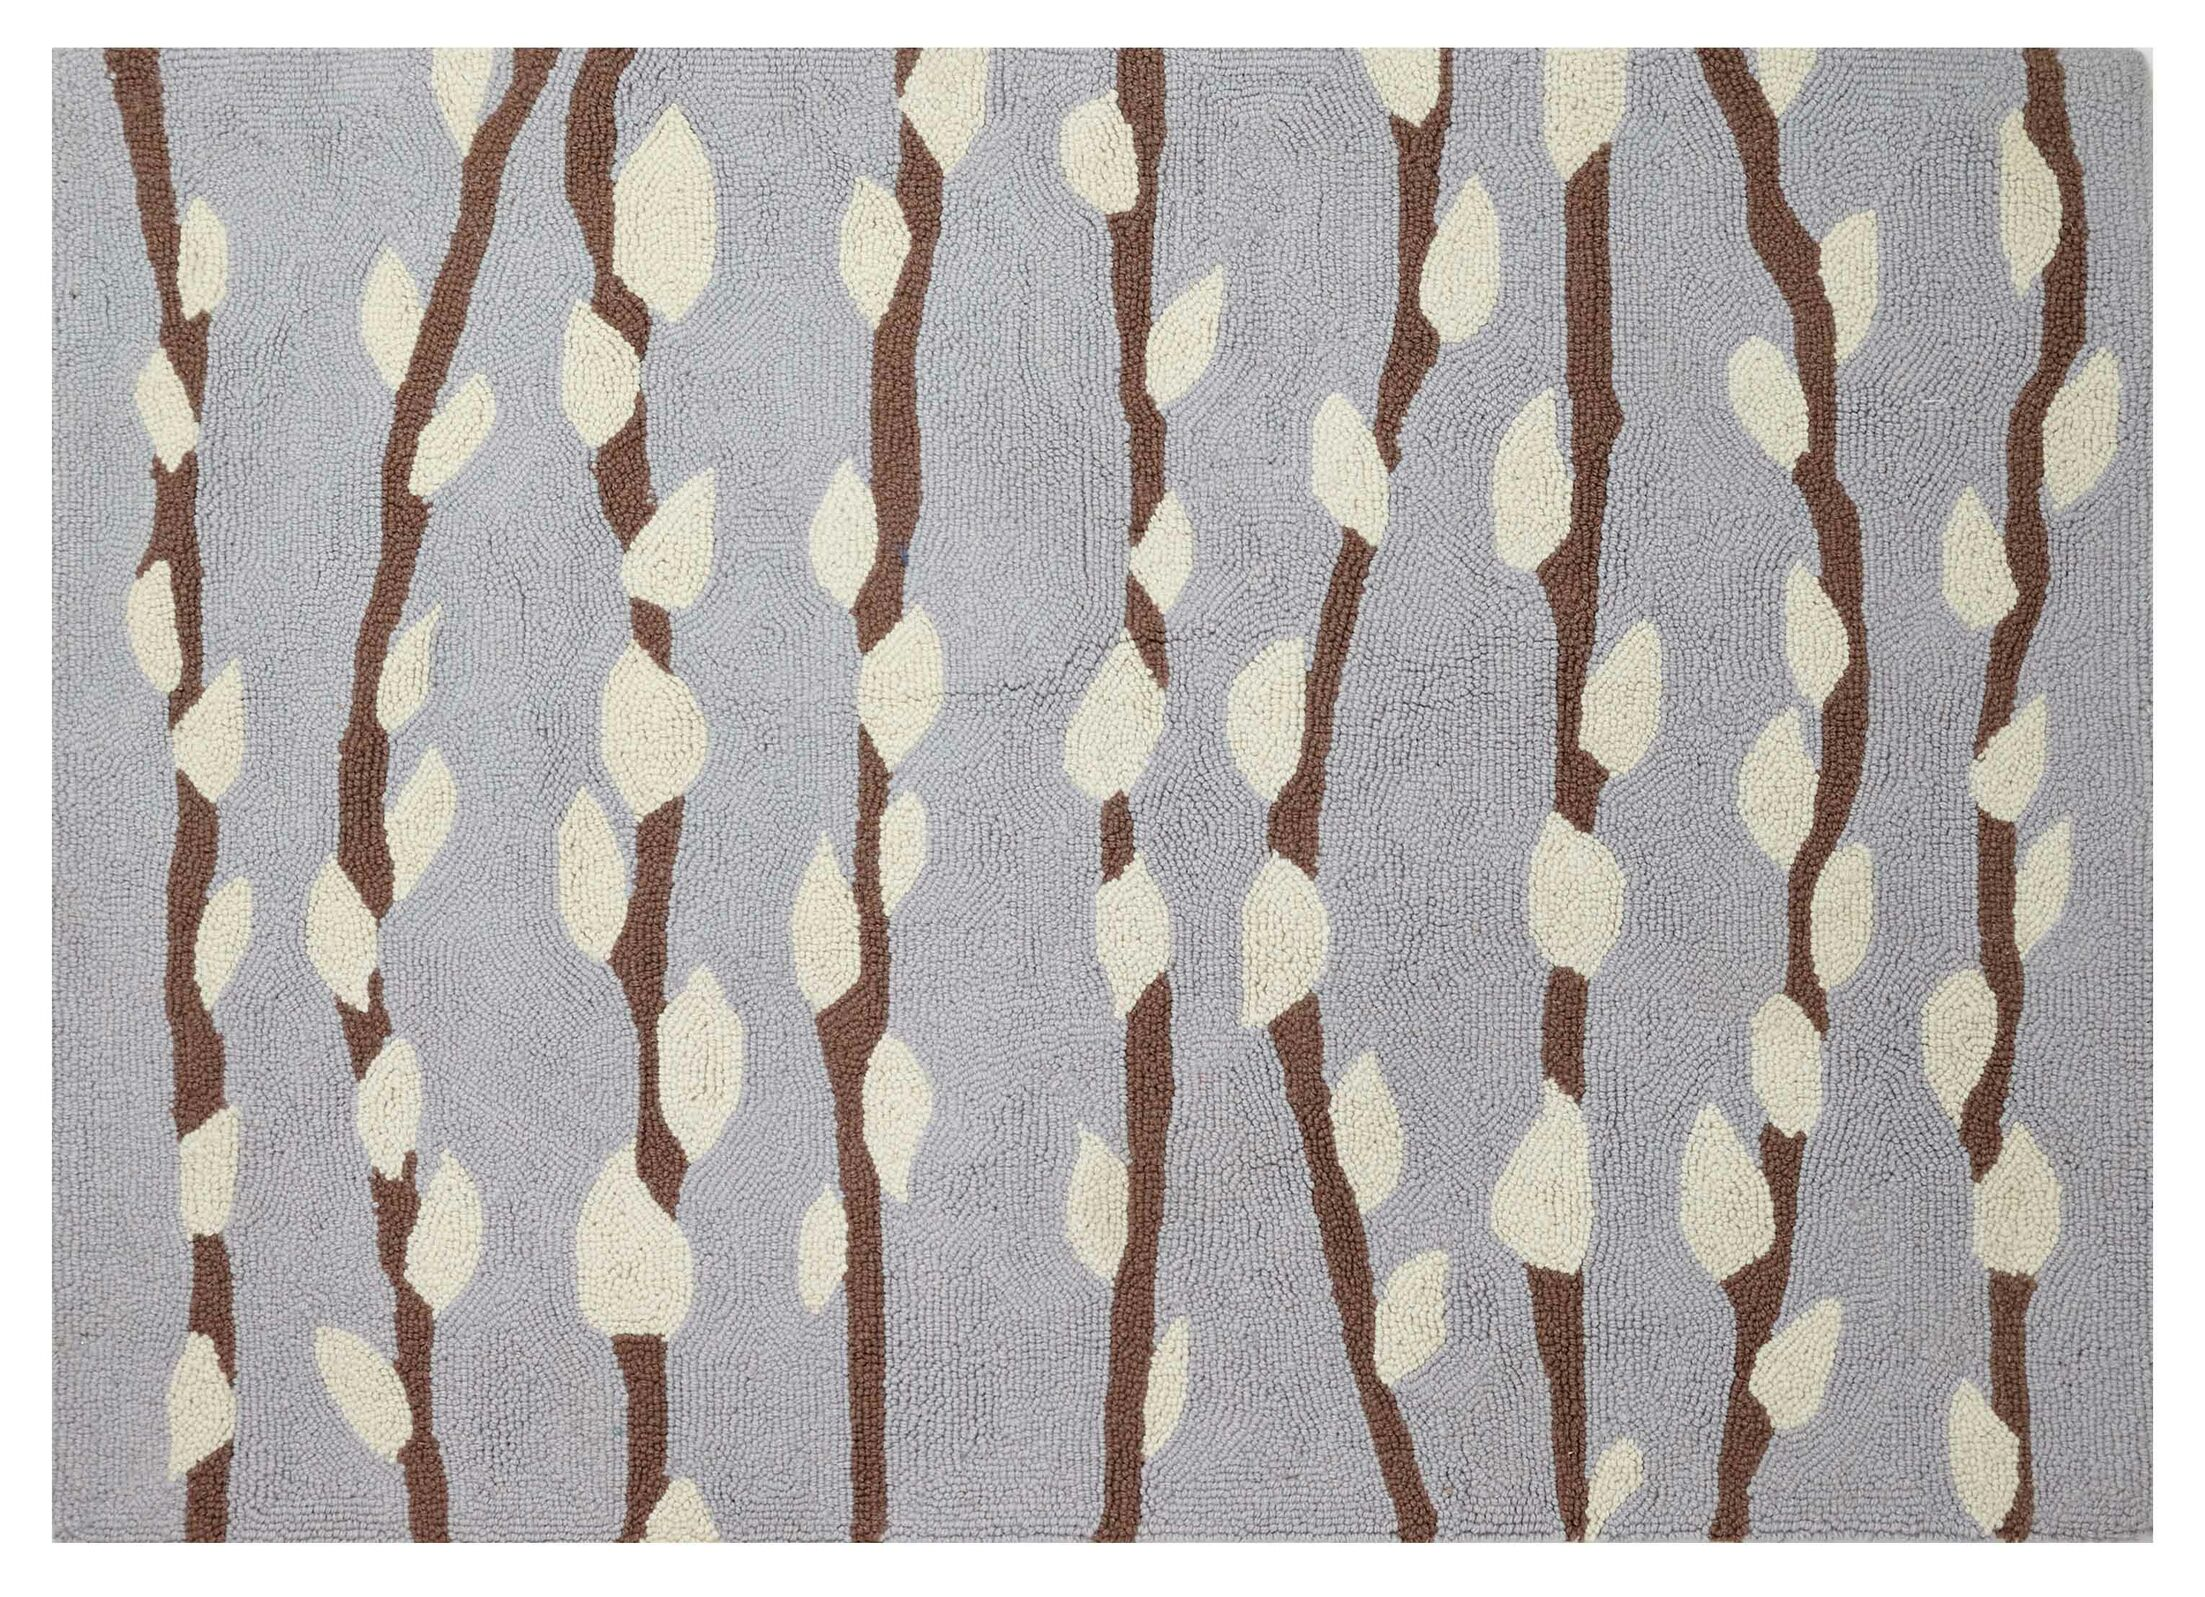 Beardall Hand-Hooked Wool Light Blue Area Rug